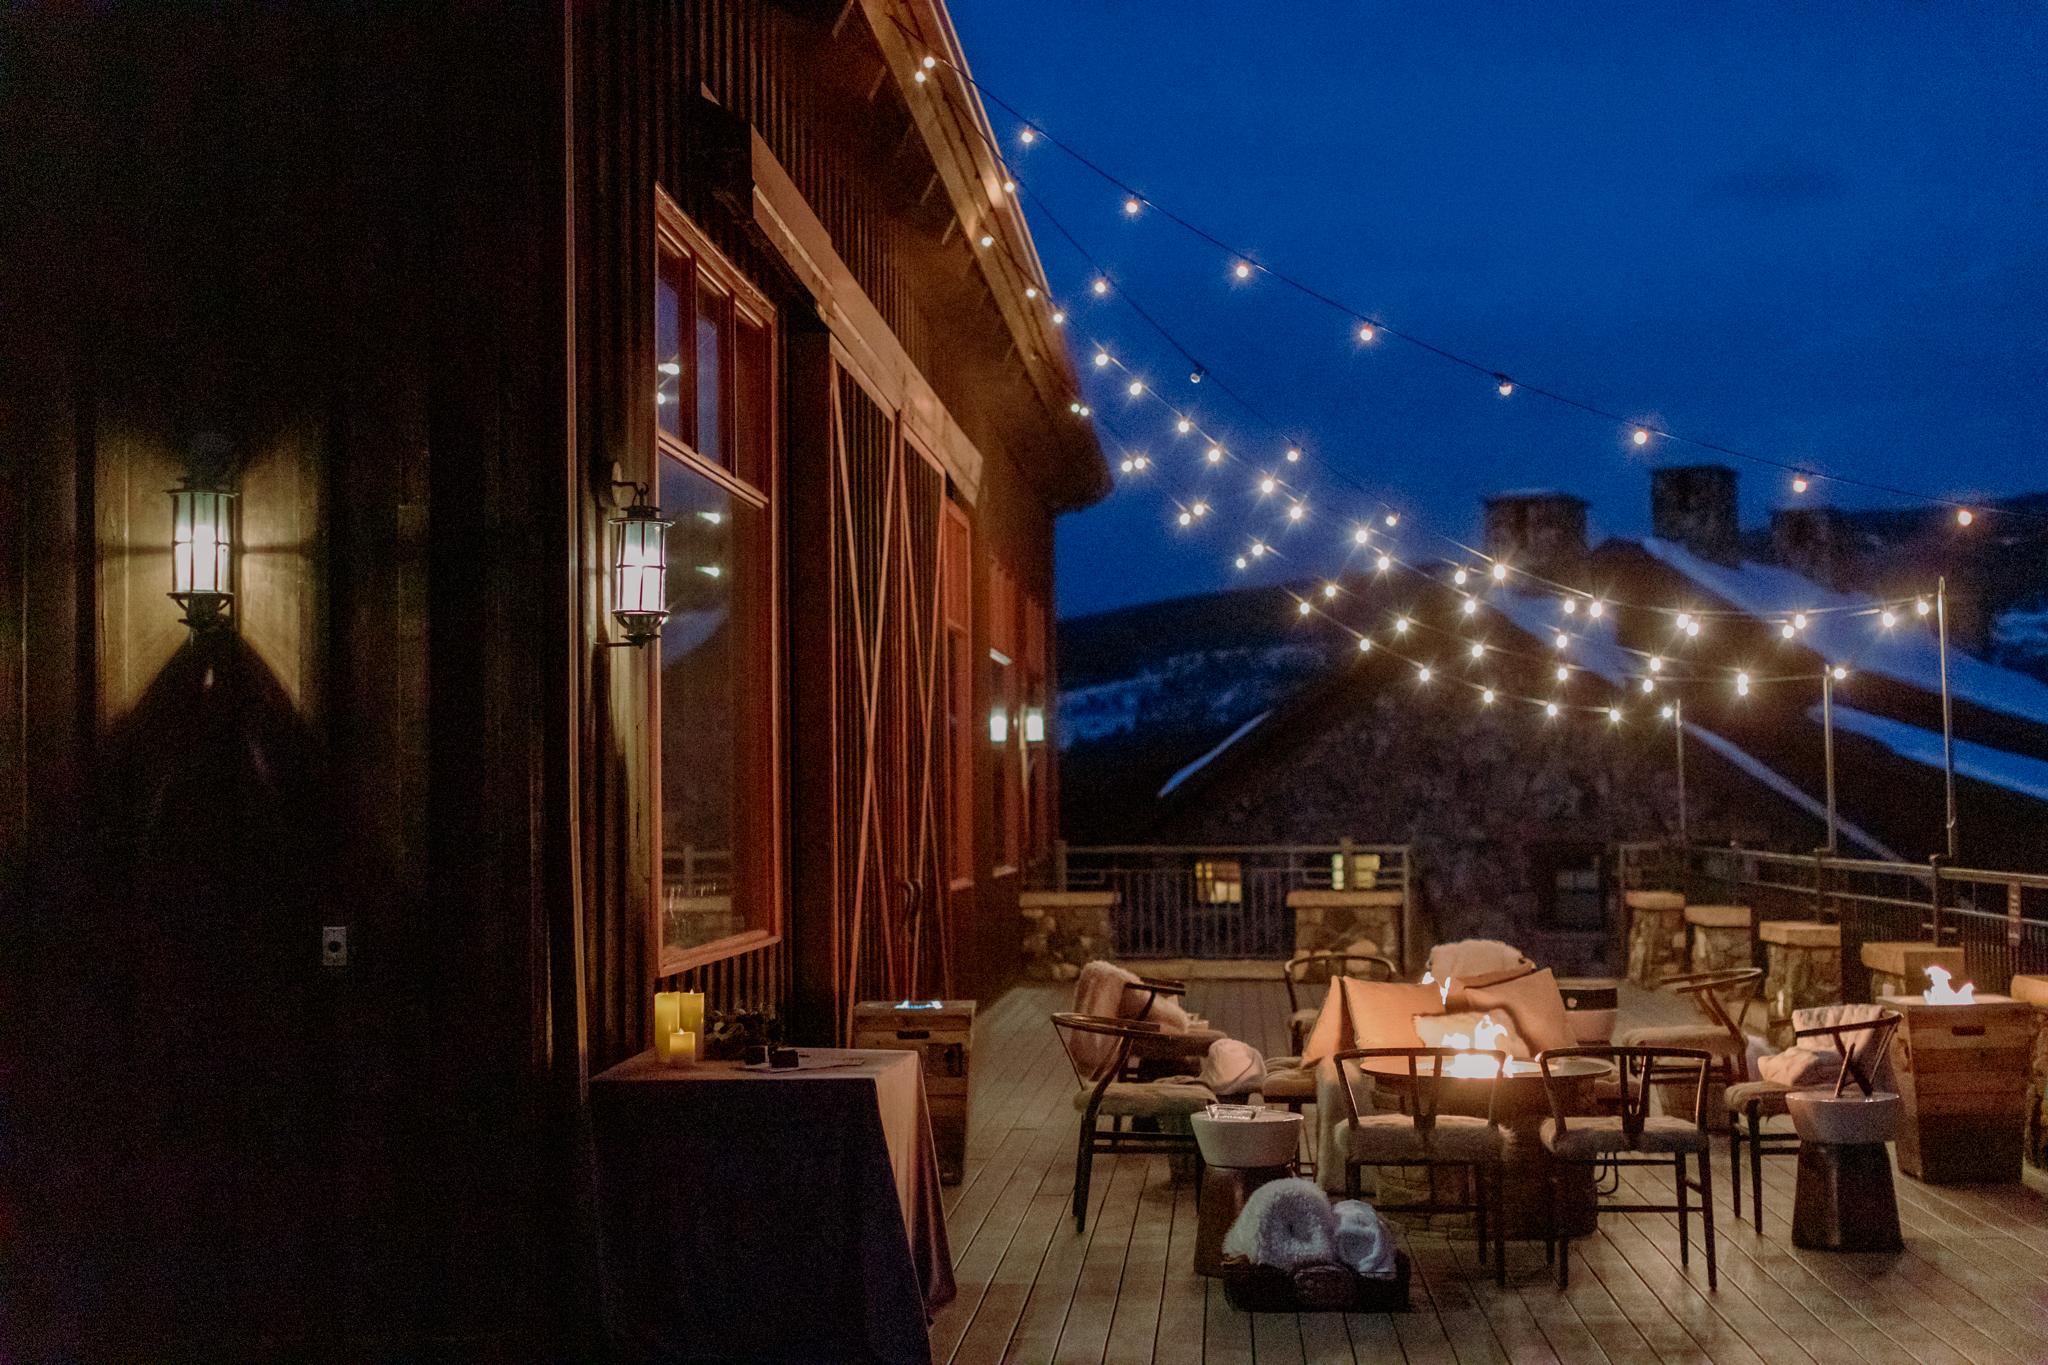 Devils-Thumb-Ranch-Tabernash-Colorado-Winter-Broad-Axe-Barn-Outdoor-Cigar-Lounge-at-Night